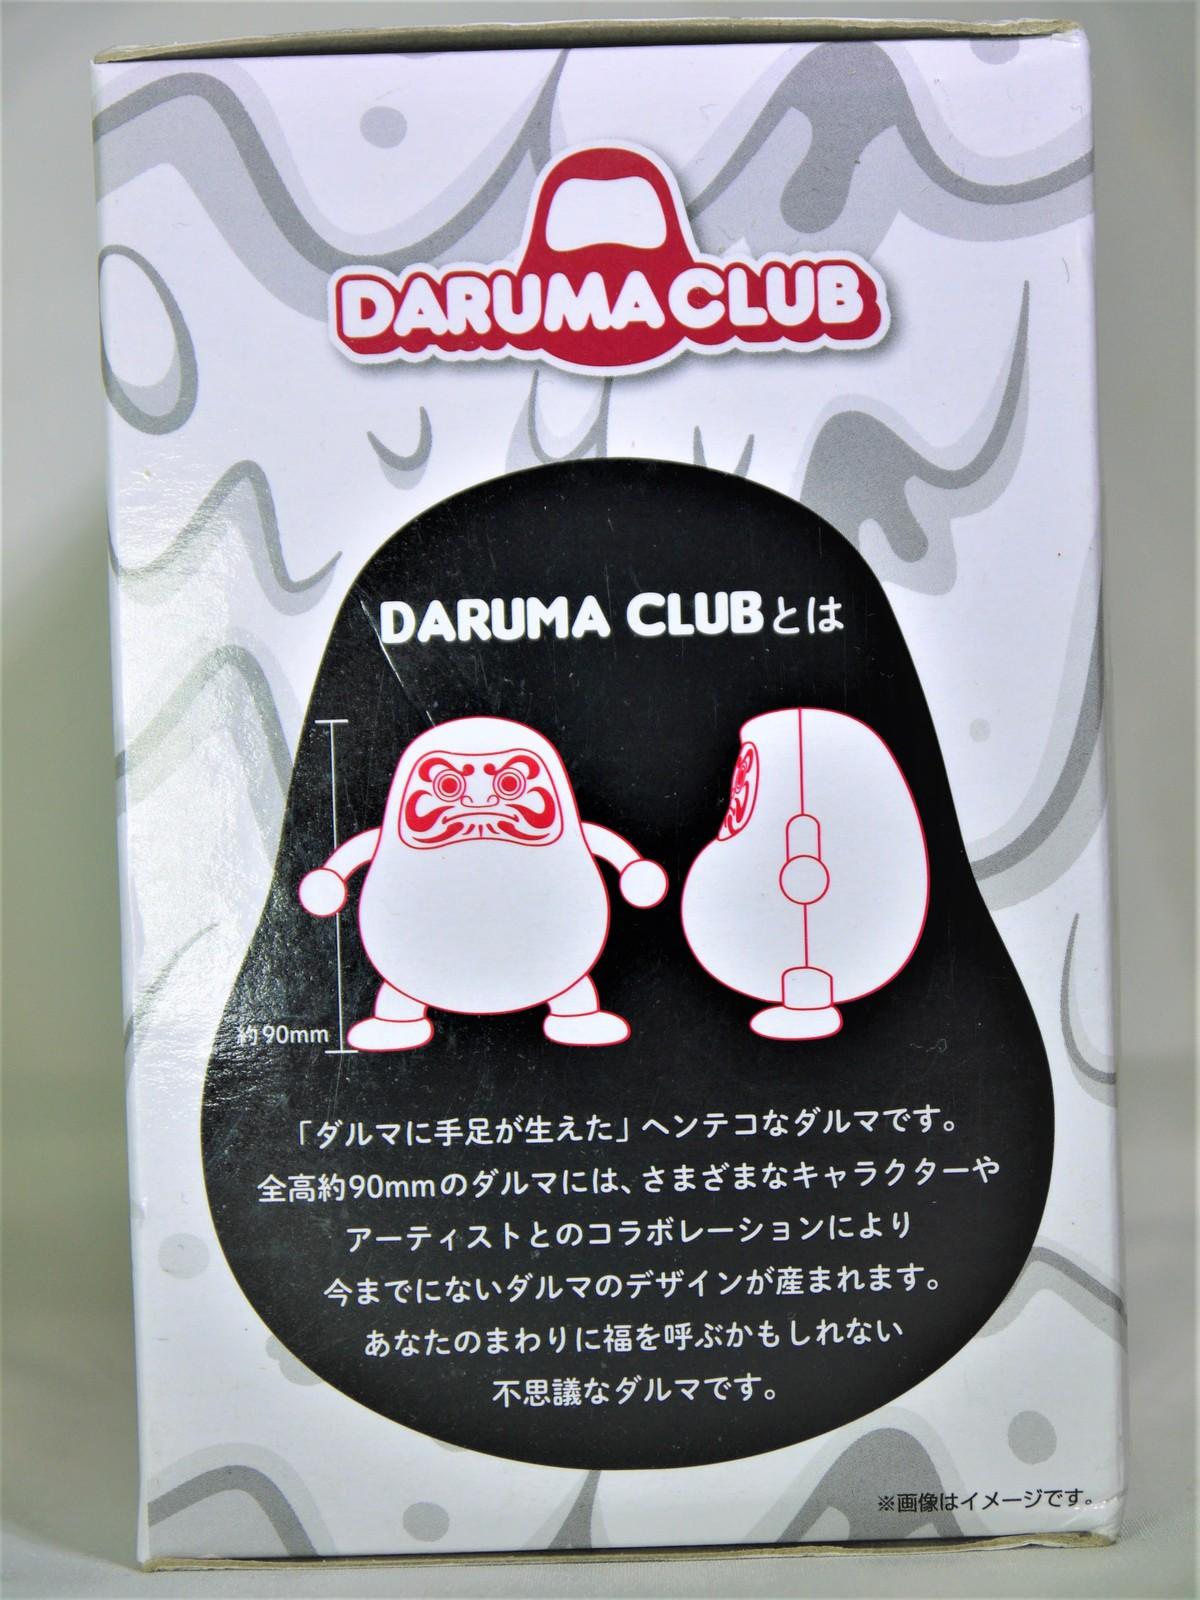 BANDAI DARUMA CLUB GHOSTBUSTERS MARSHMALLOW MAN DARUMA FIGURE WHITE